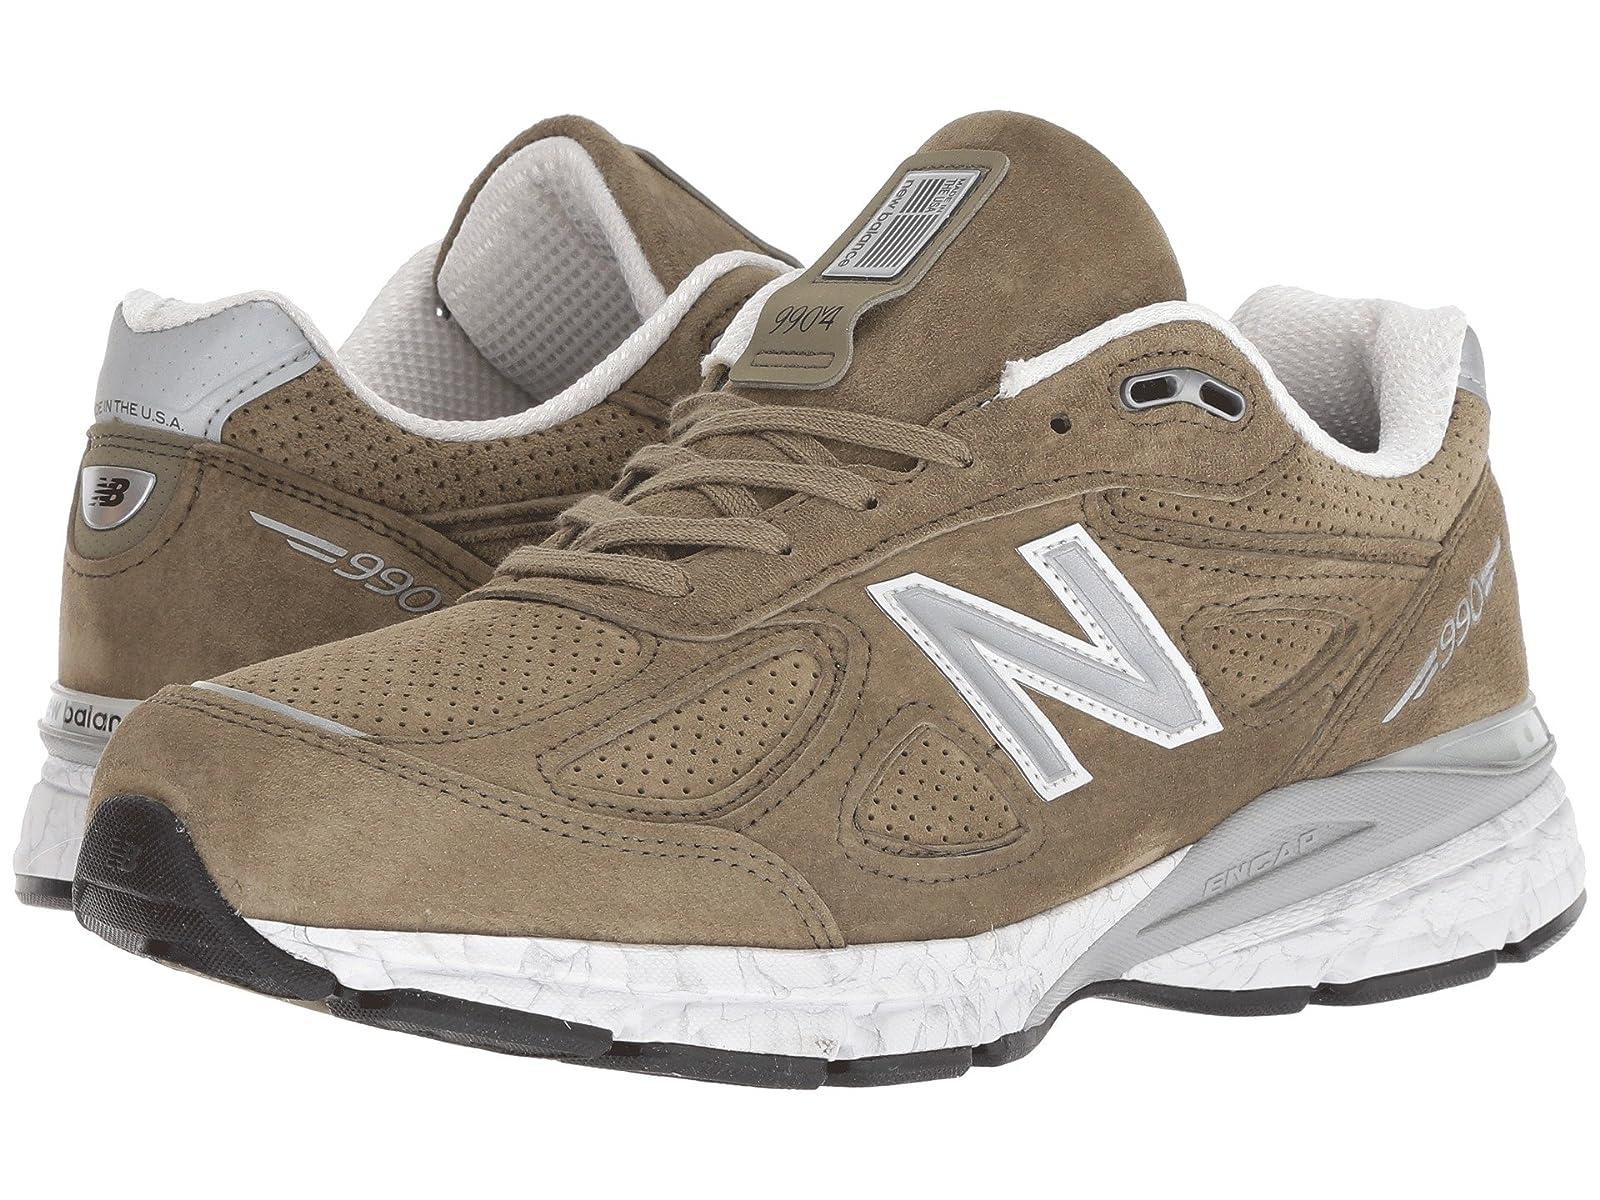 New Balance M990V4Atmospheric grades have affordable shoes